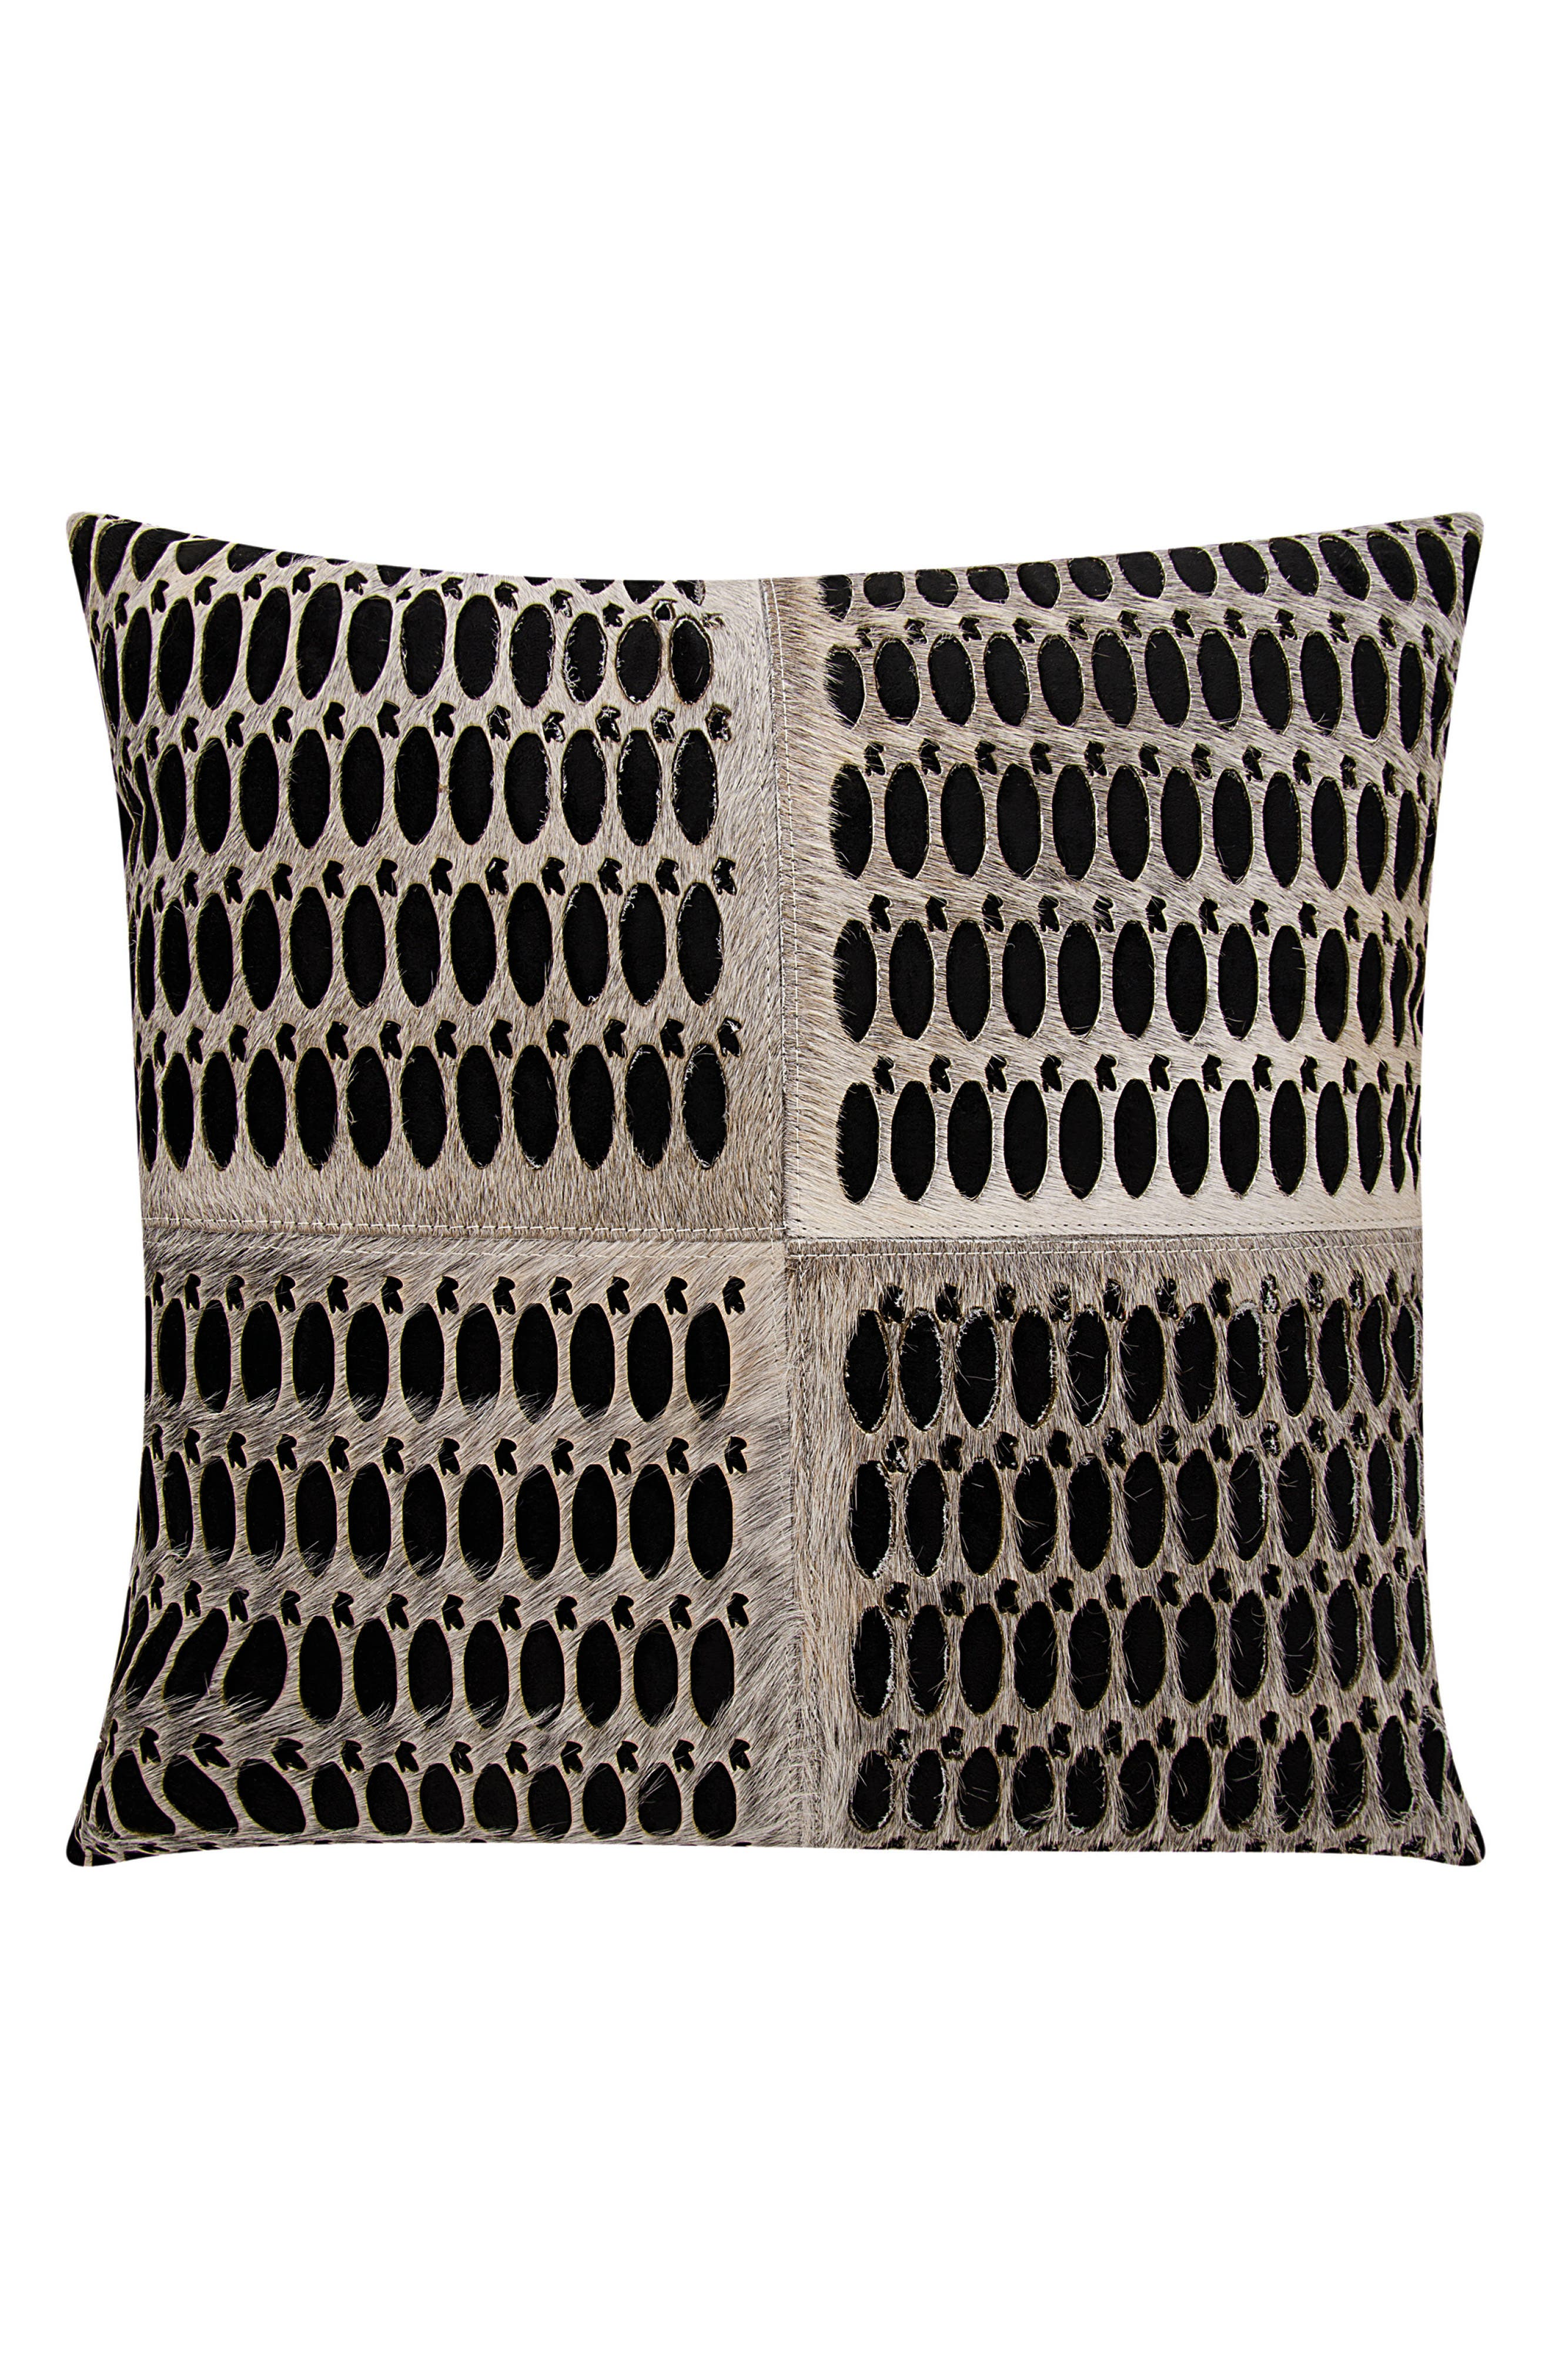 Calf Hair Accent Pillow,                             Main thumbnail 1, color,                             062